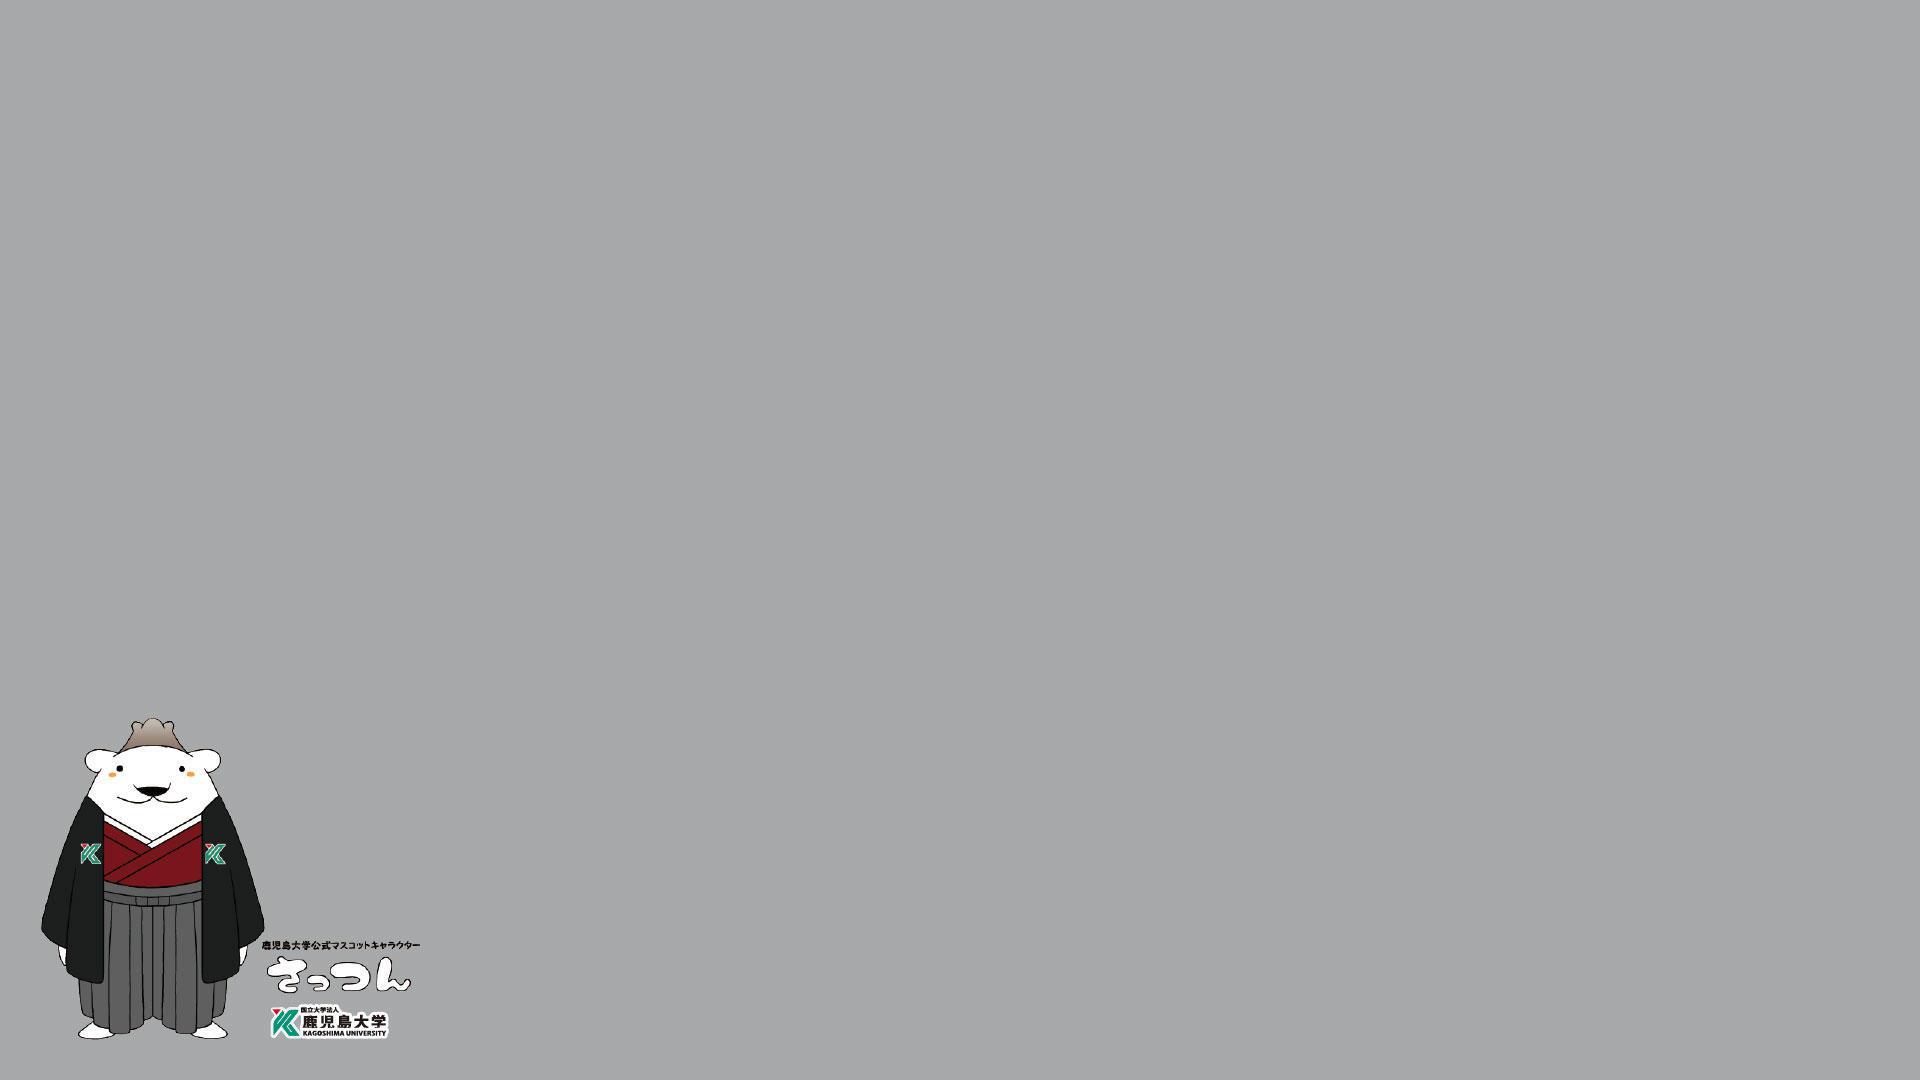 kuniv_virtual_background_pic09.jpg